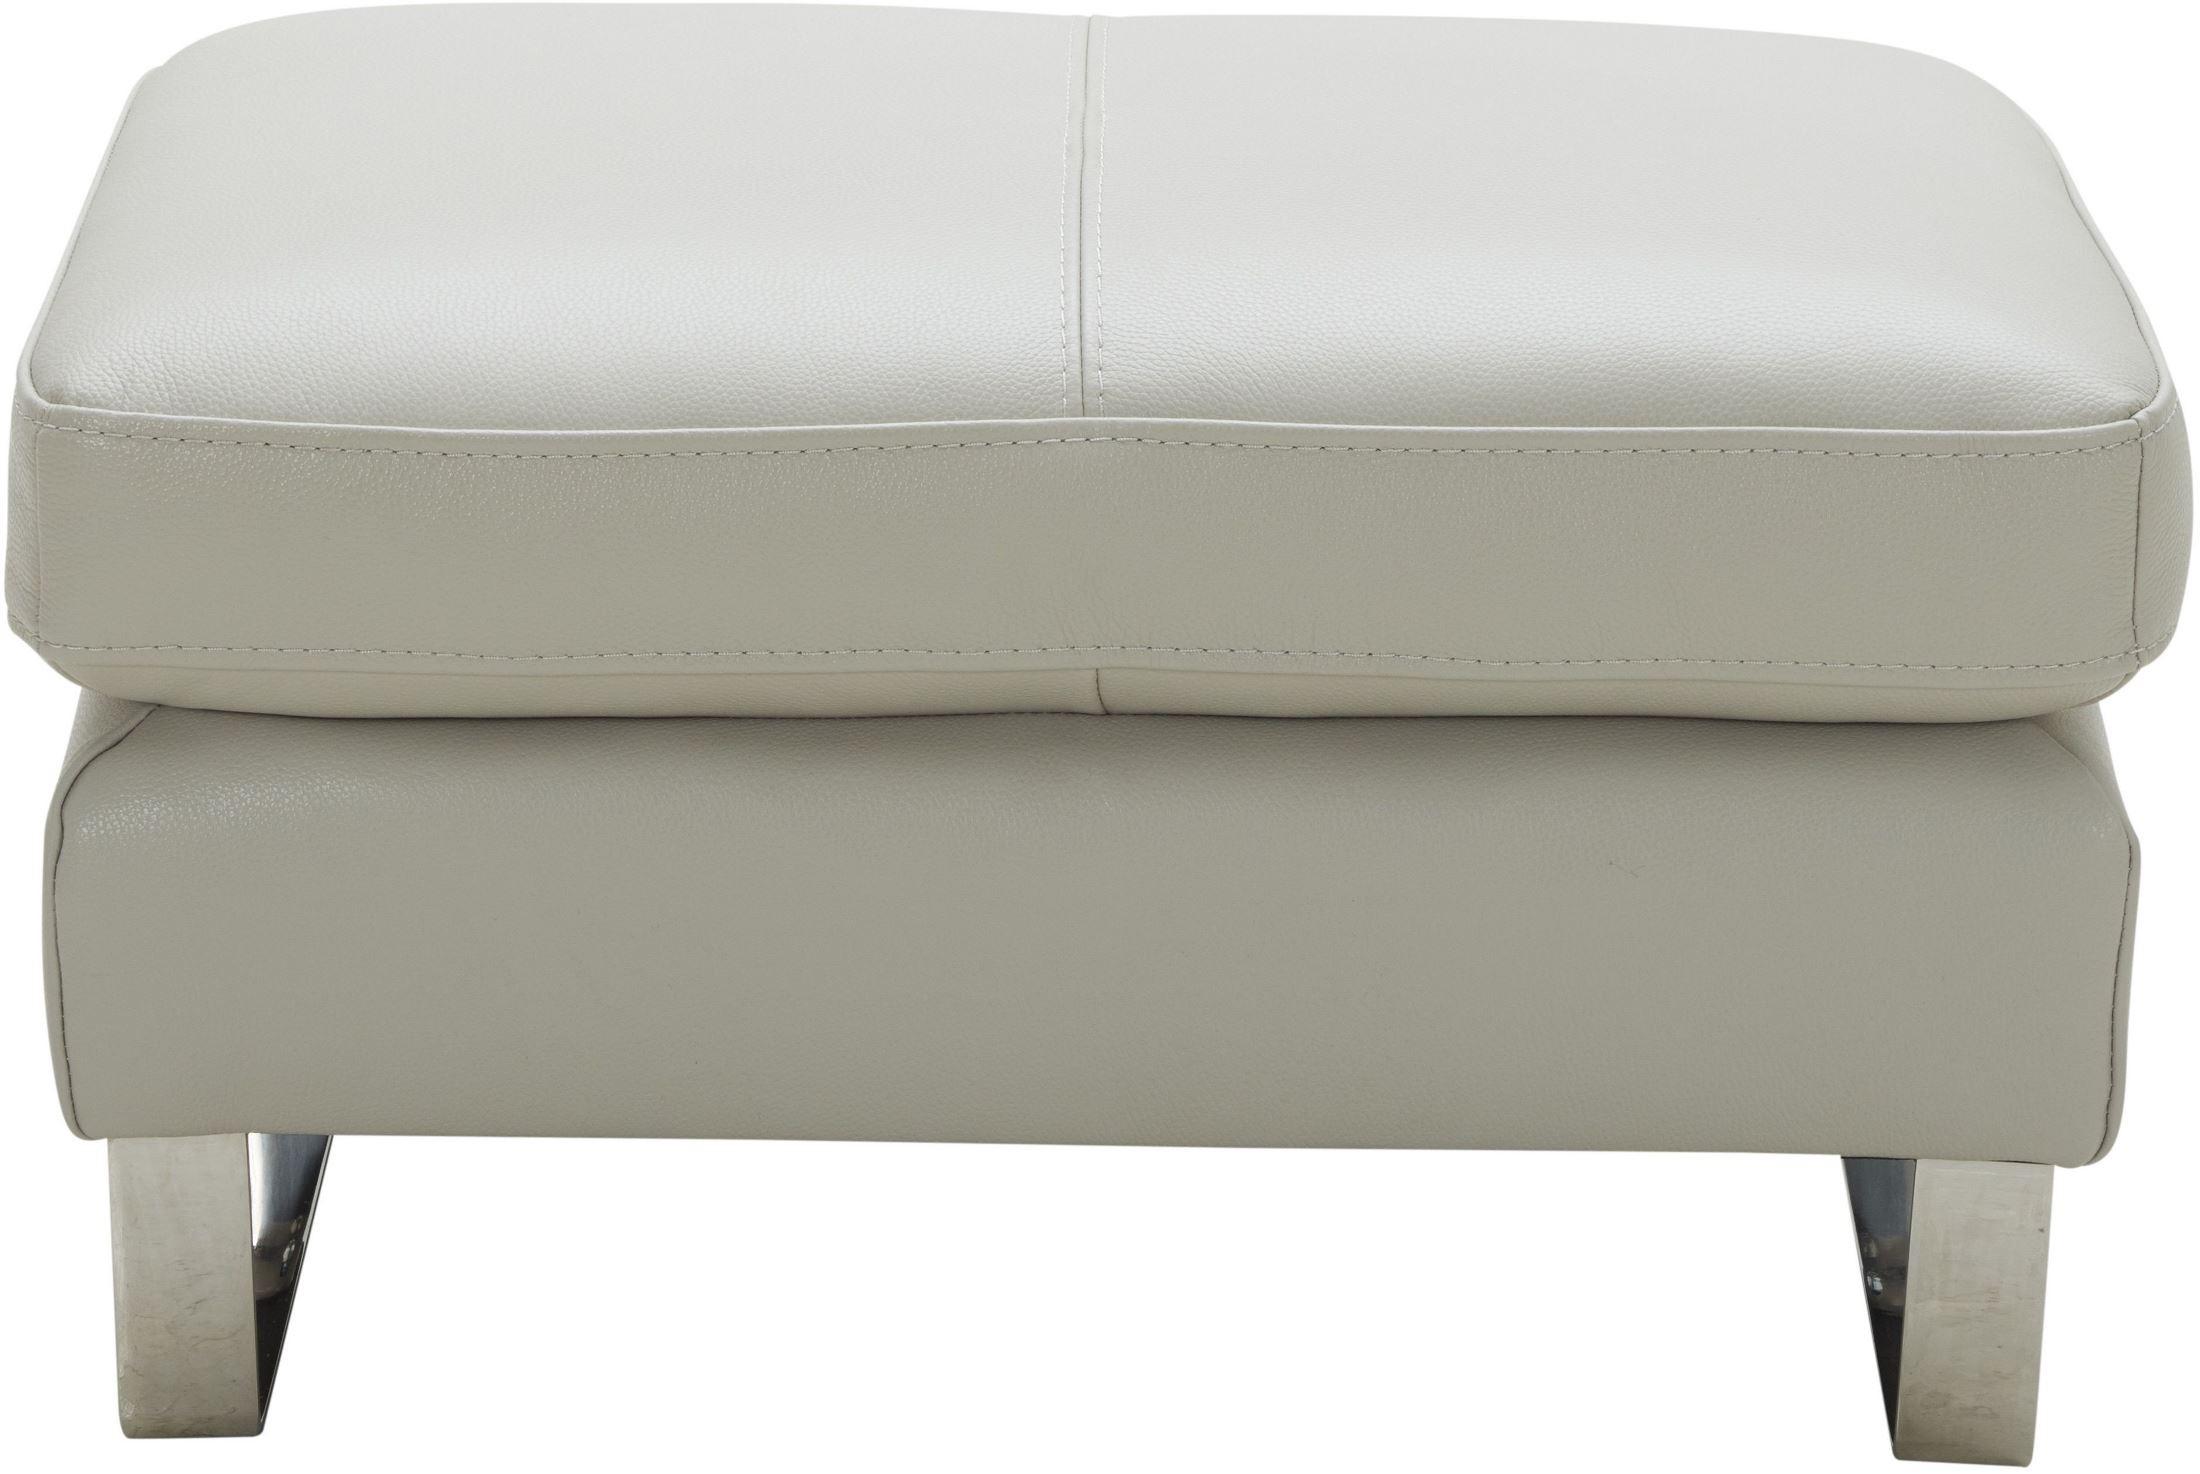 Excellent Constantin Light Grey Leather Ottoman Inzonedesignstudio Interior Chair Design Inzonedesignstudiocom